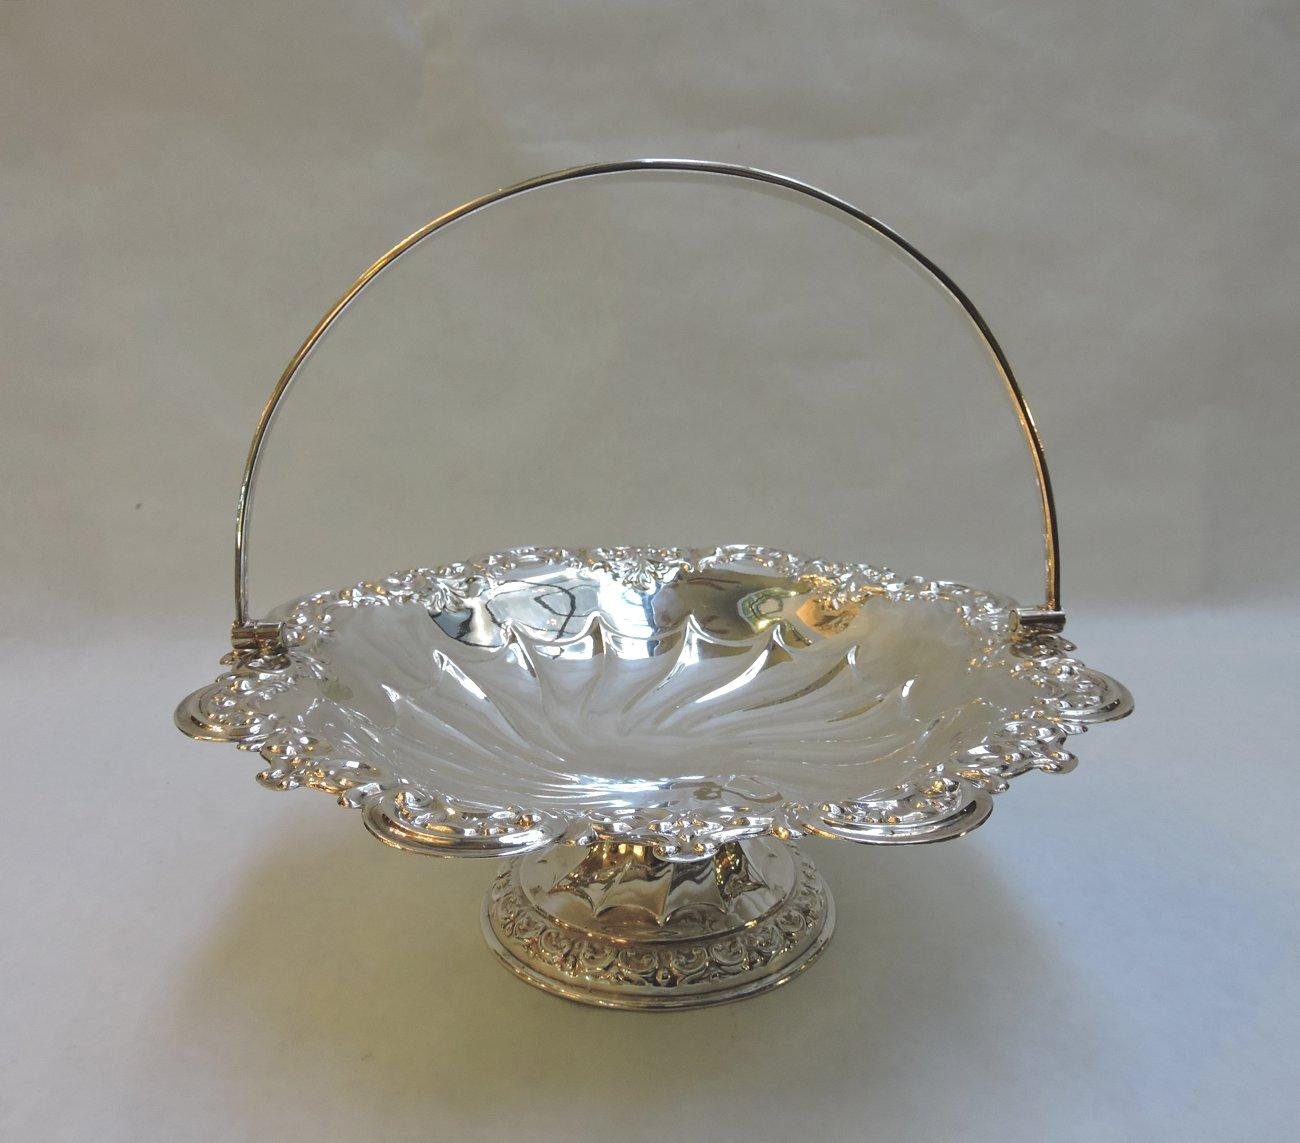 silver - silverplatedbridebasket-05.jpg